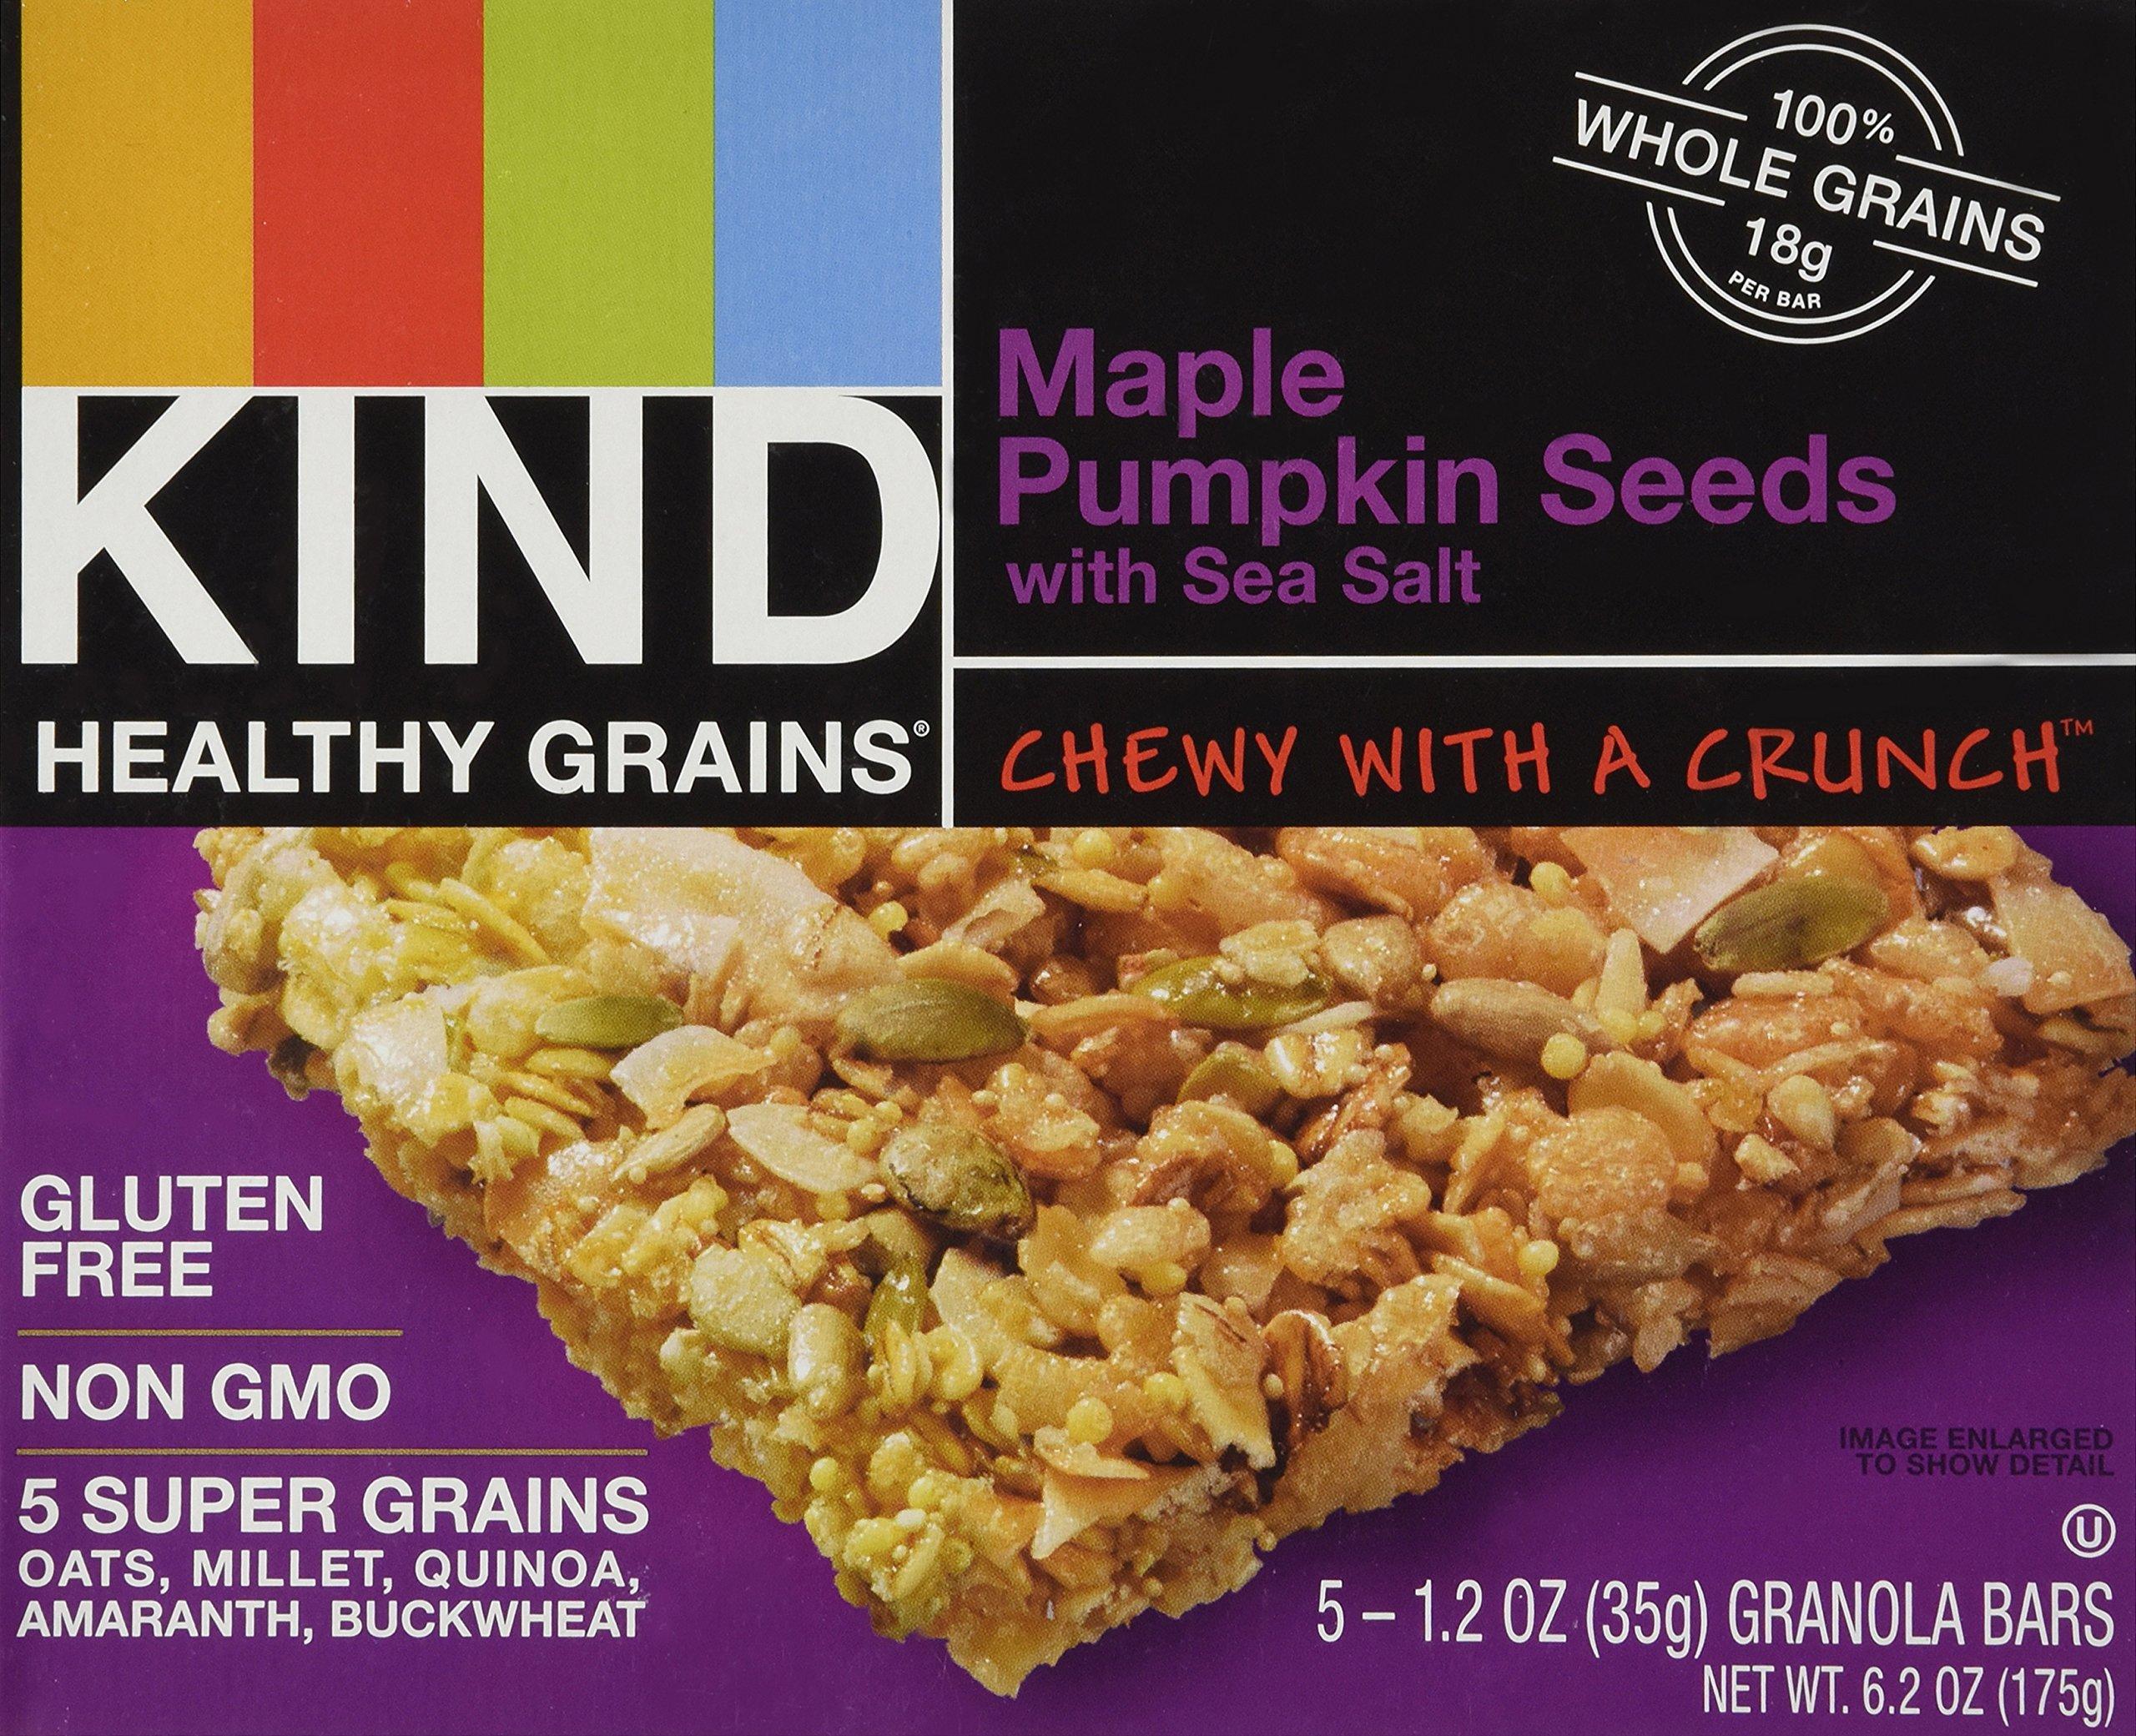 KIND Healthy Grains Bars - Maple Pumpkin Seeds with Sea Salt - 1.2 oz - 5 ct - 4 pk by KIND